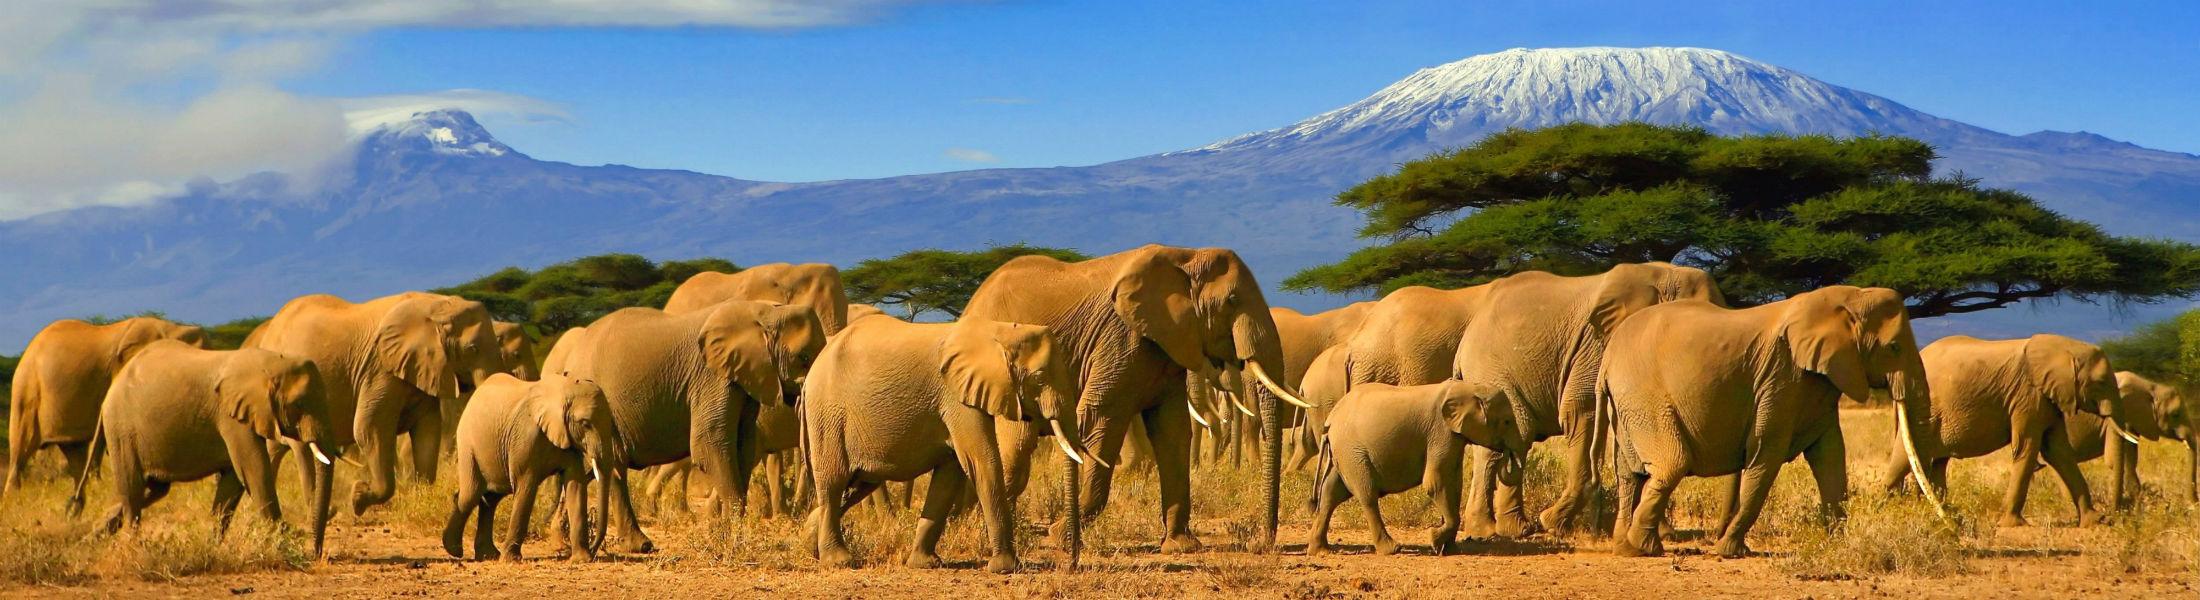 Elephants walking with Kilimanjaro behind